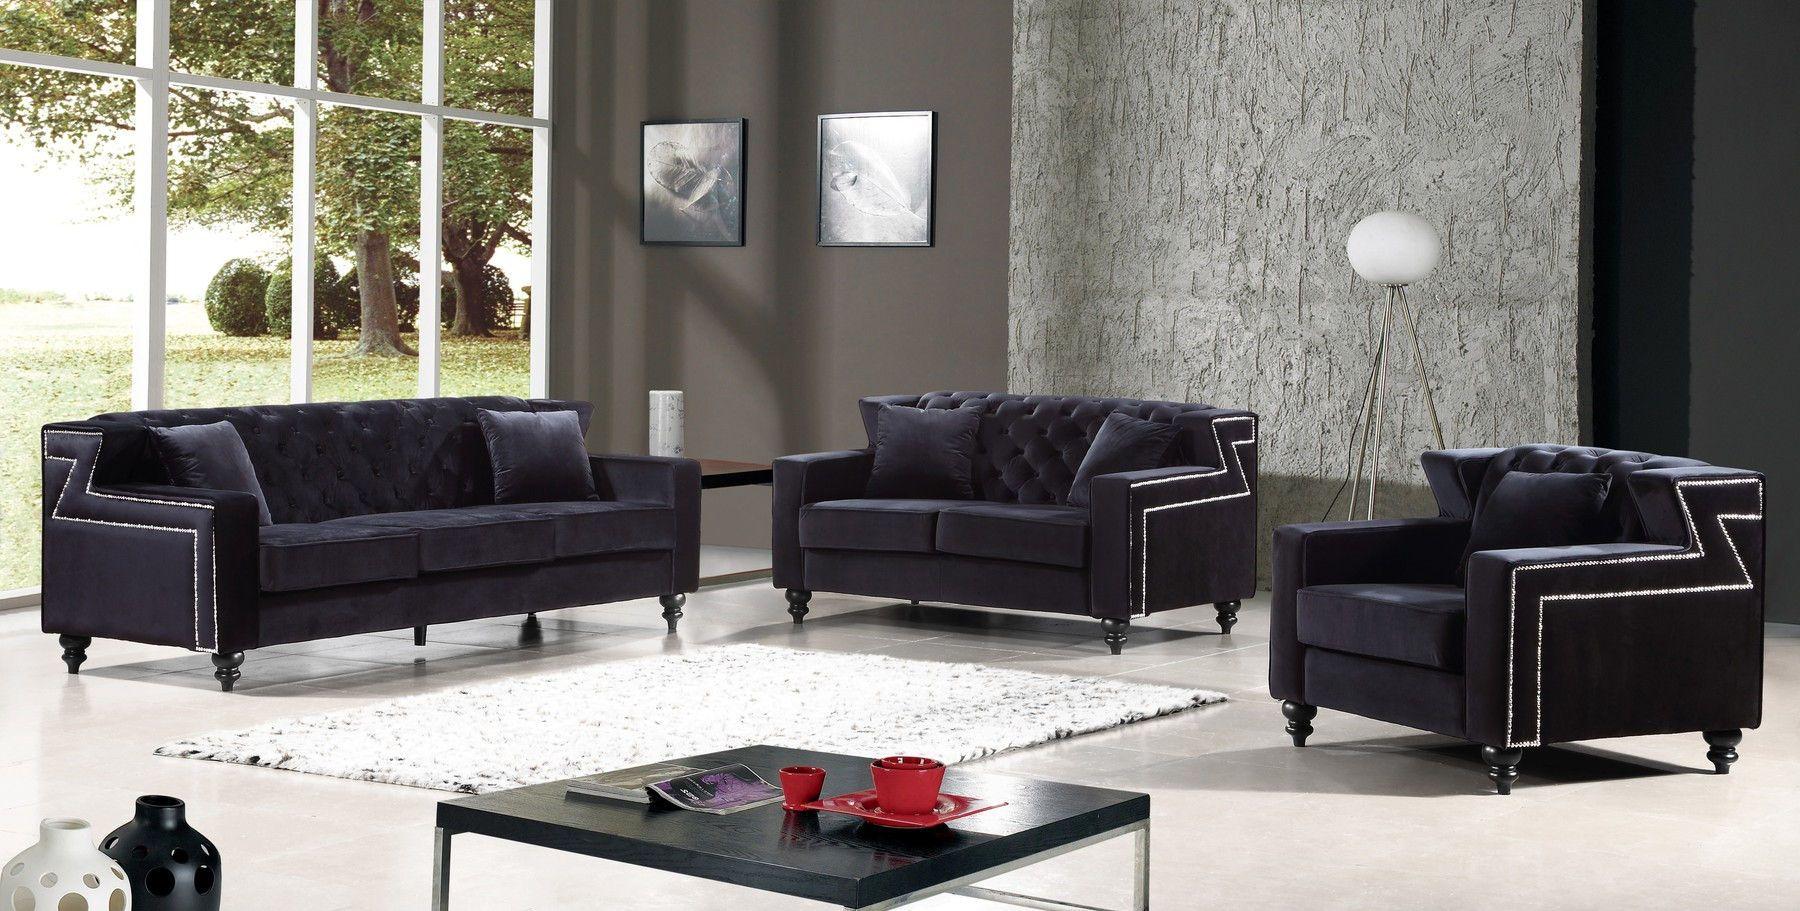 Harley Black Sofa 616 Meridian Furniture Fabric Sofas Velvet Living Room Living Room Sets Nailhead Living Room